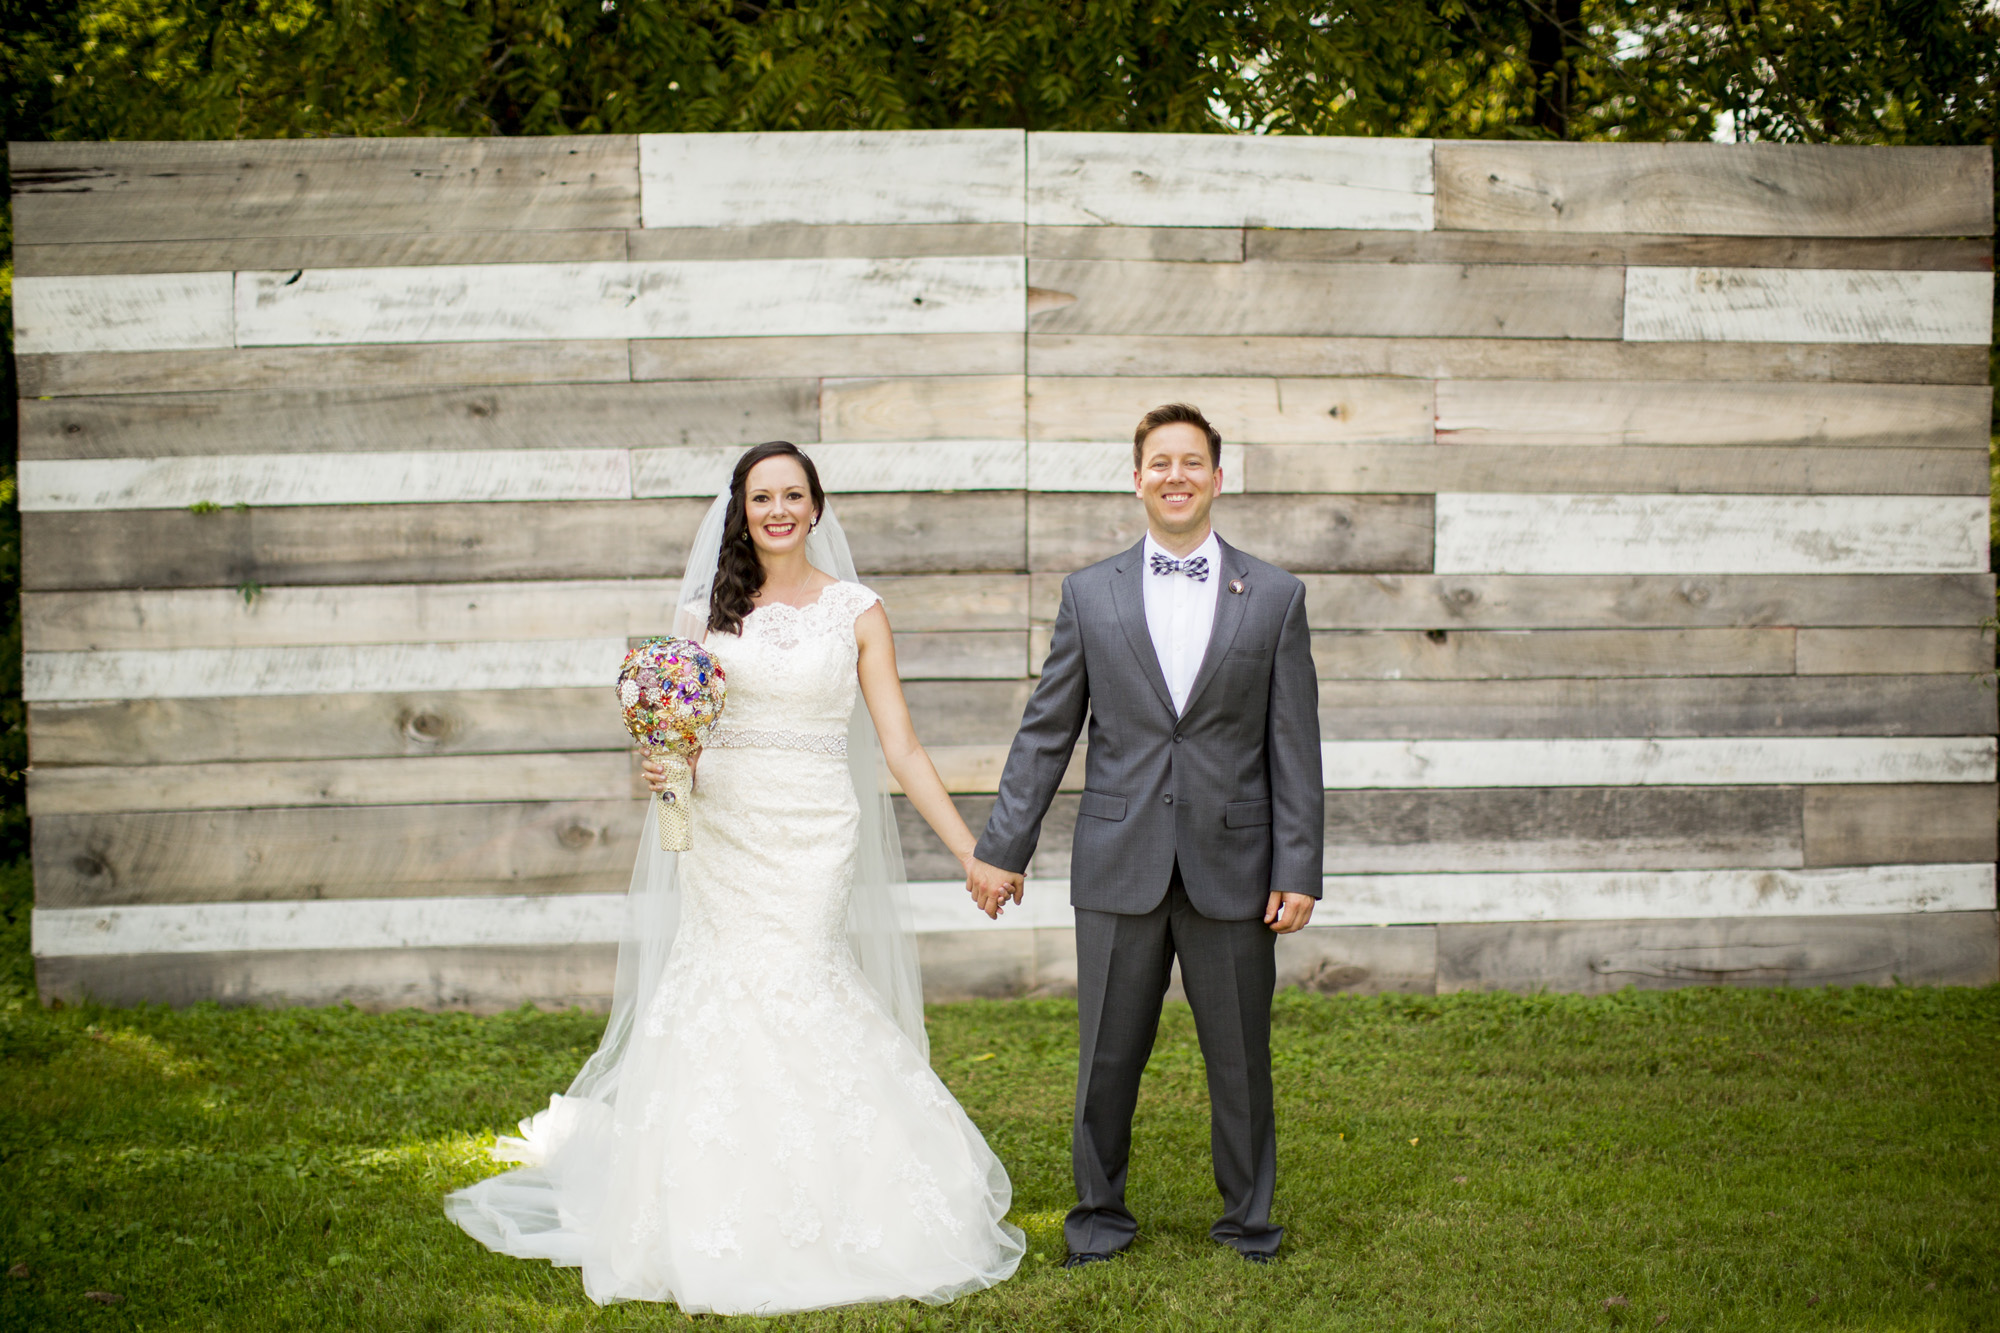 Seriously_Sabrina_Photography_Bowling_Green_Kentucky_Highland_Stables_Wedding_Wolff48.jpg